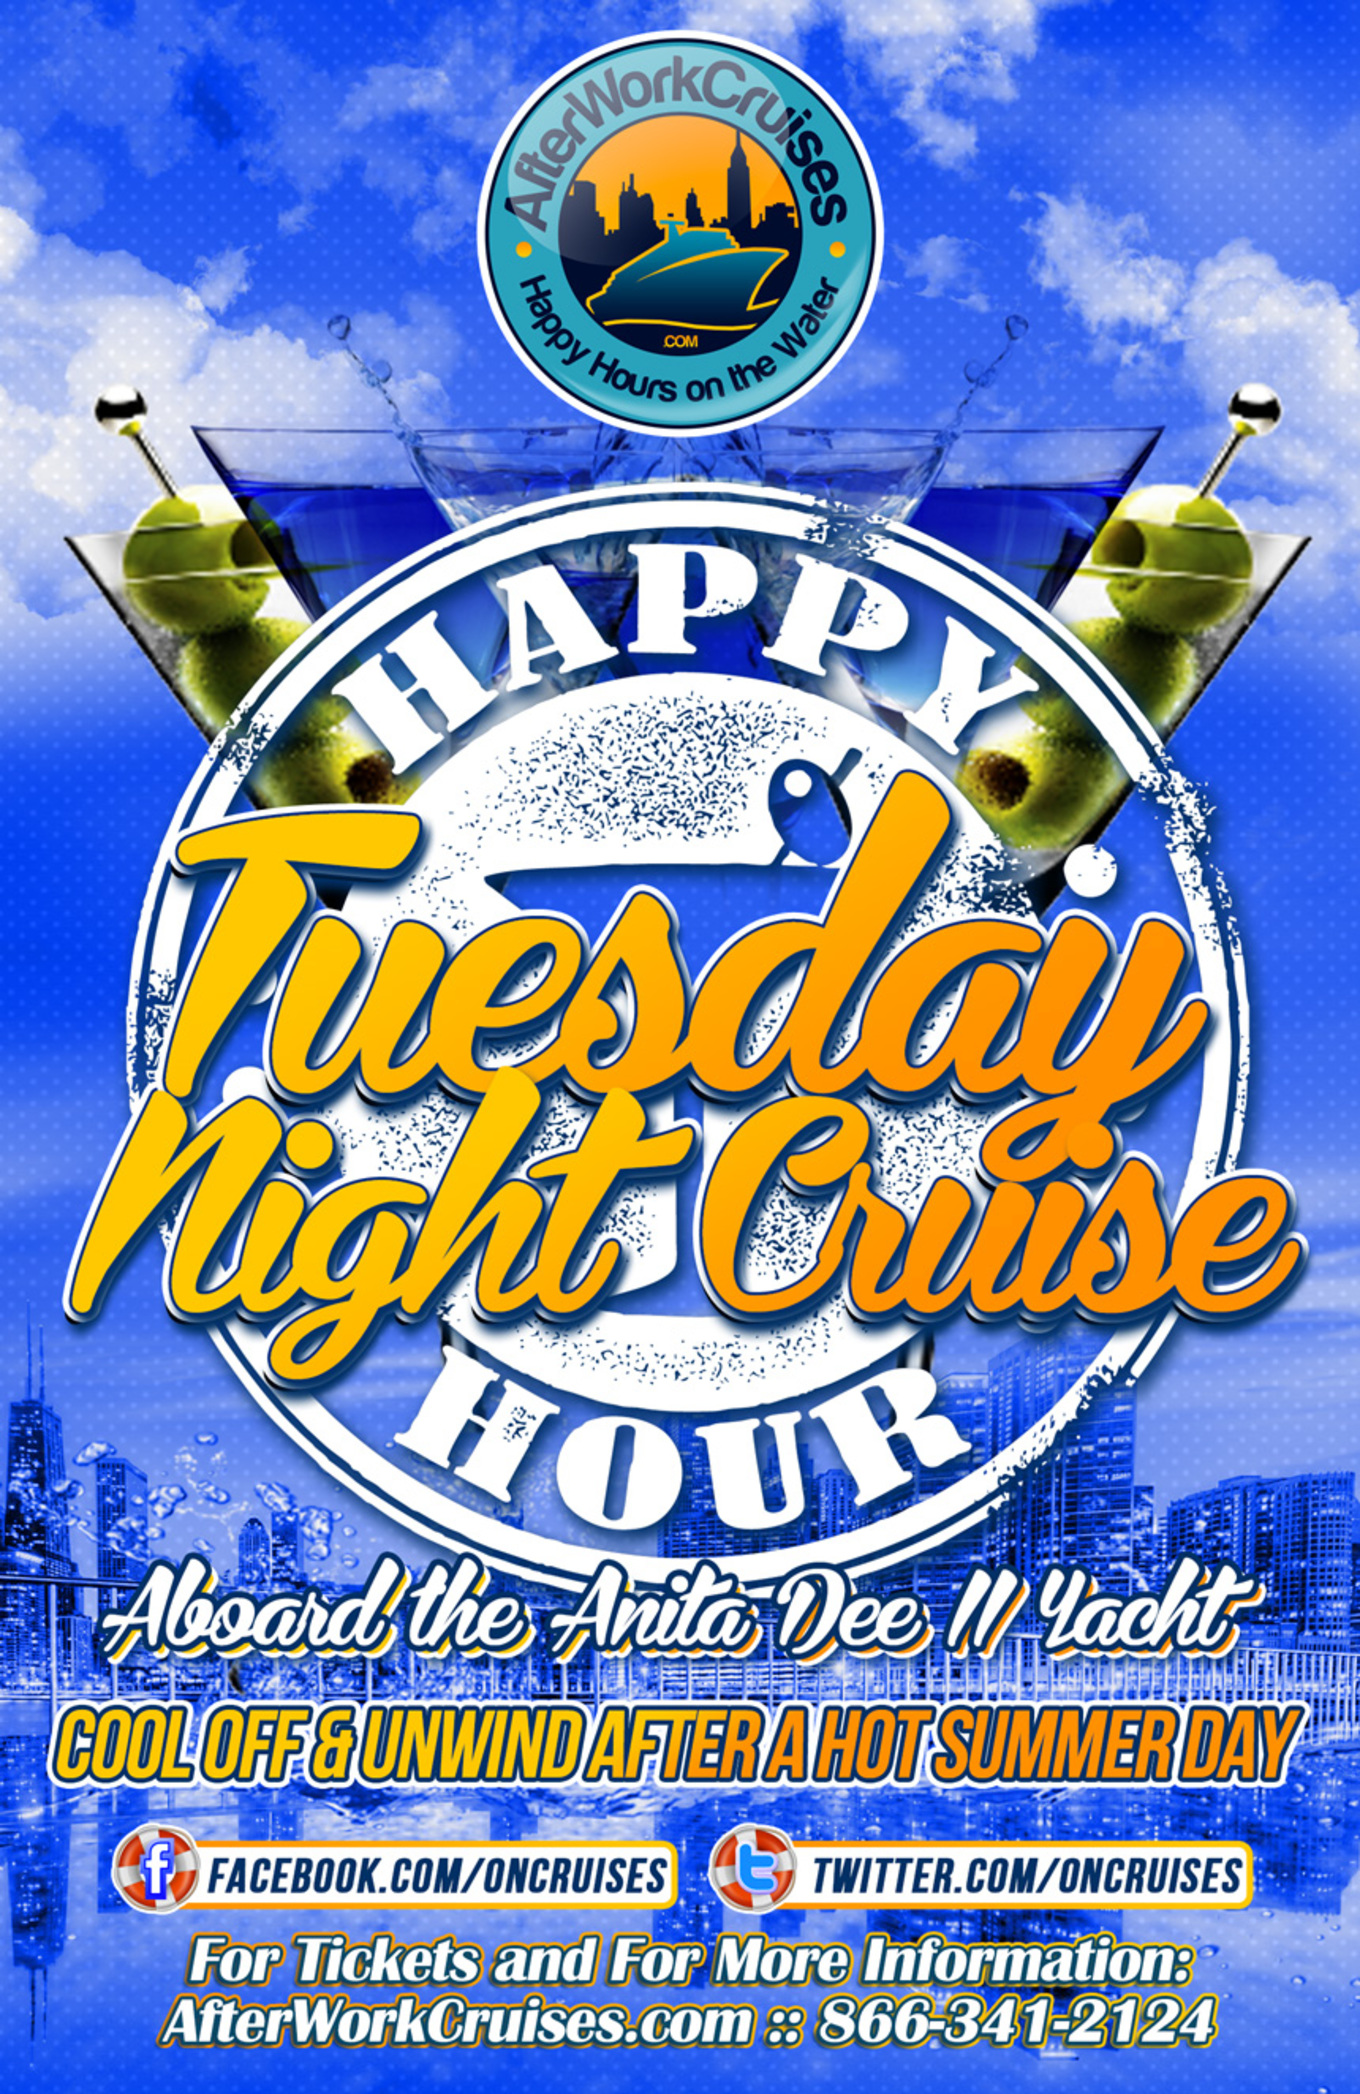 Tuesday Night Happy Hour Cruise Aboard the Anita Dee II Yacht ...